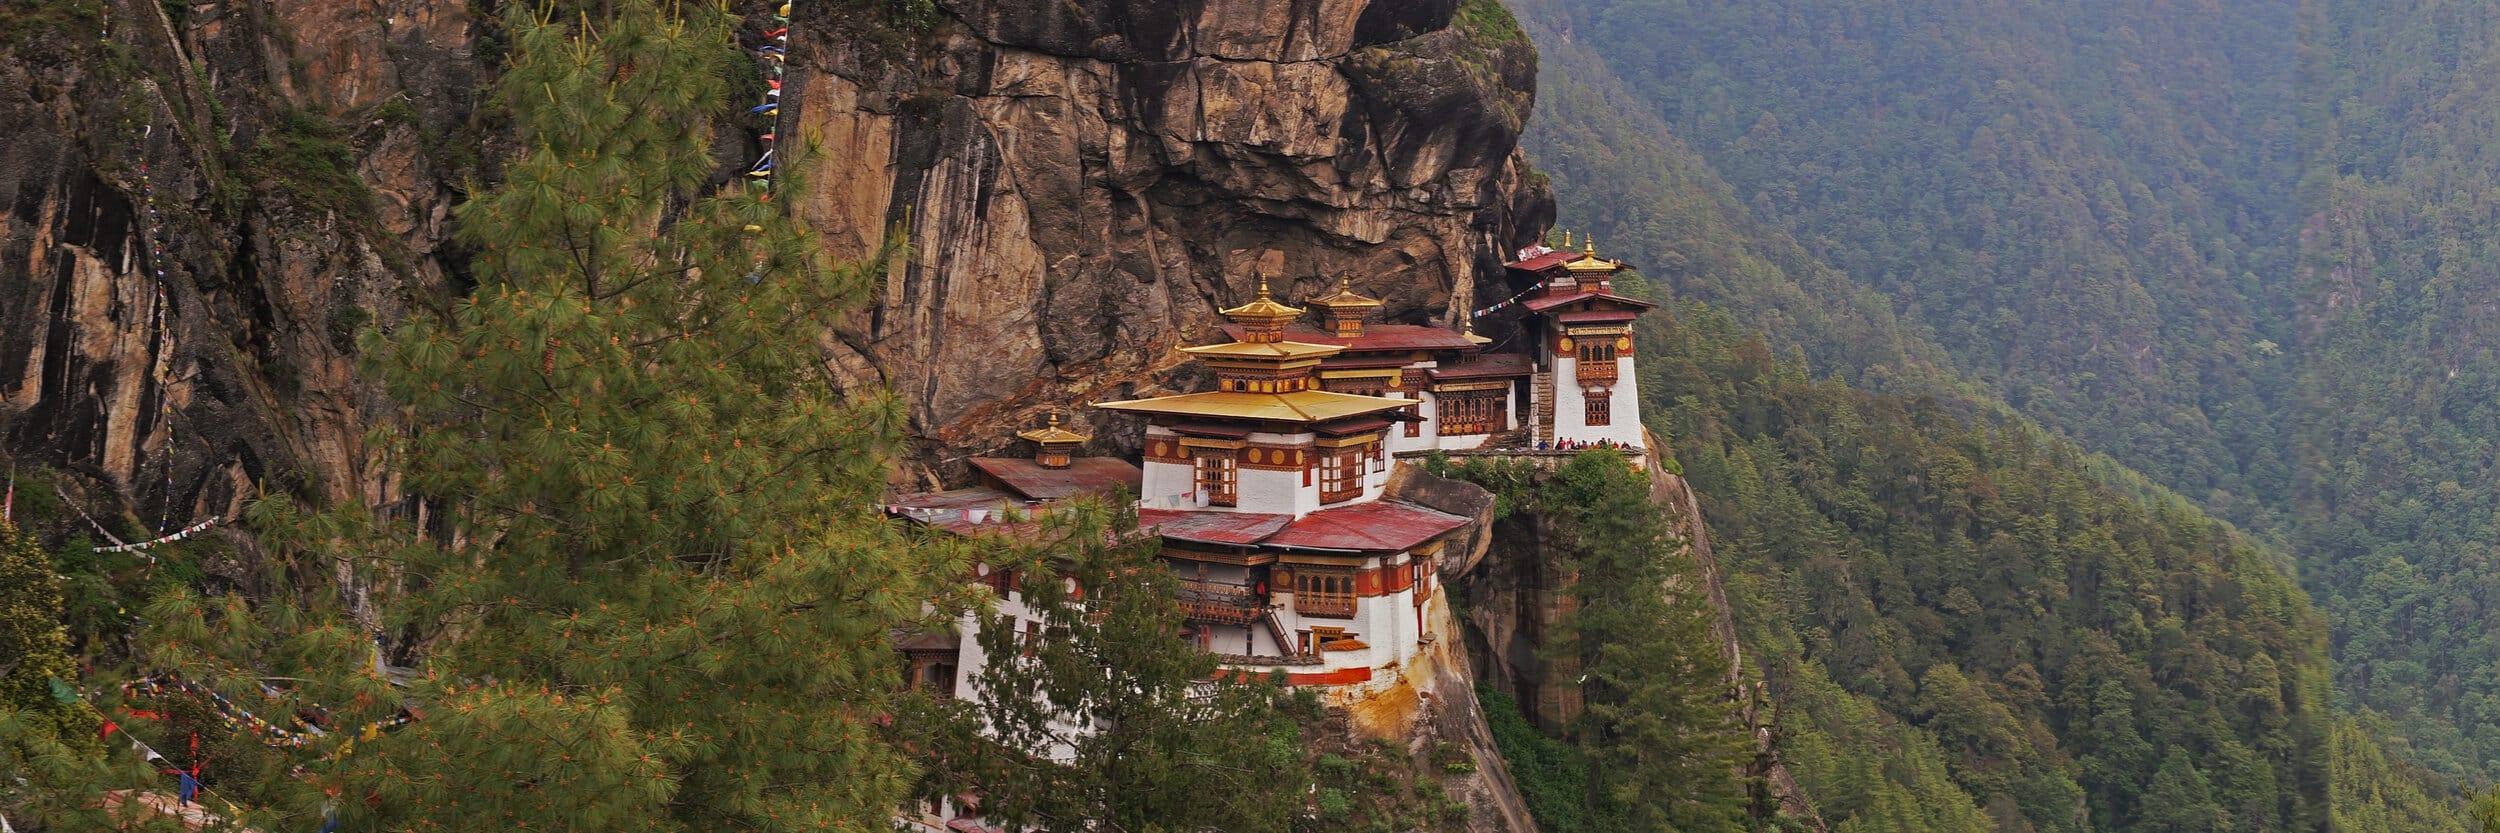 Bhutan Cliff